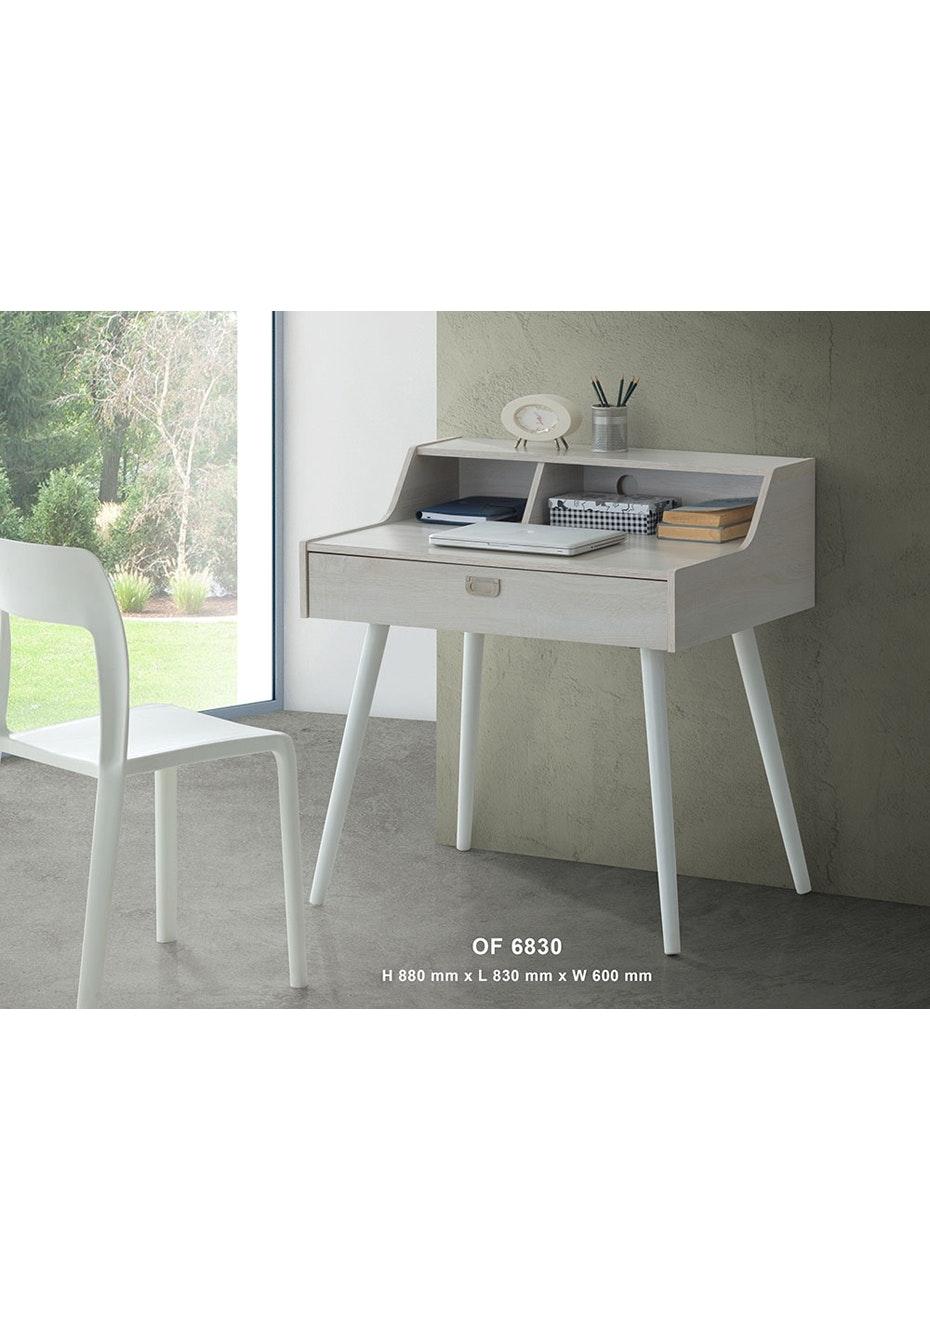 Study Desk - Washed Wood